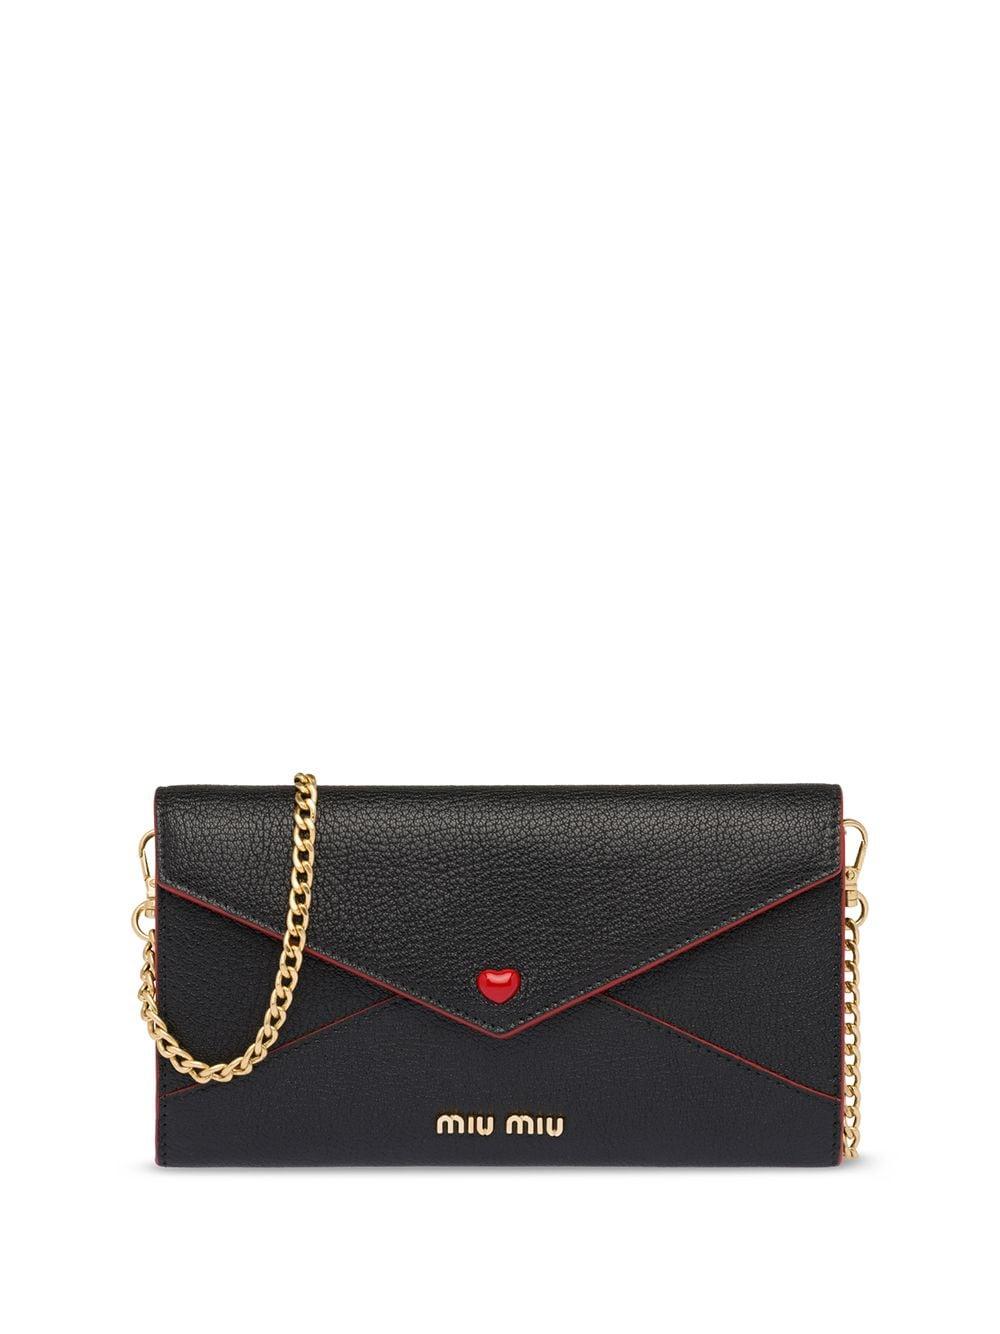 Miu Miu Portemonnaie in Kuvertform - Schwarz